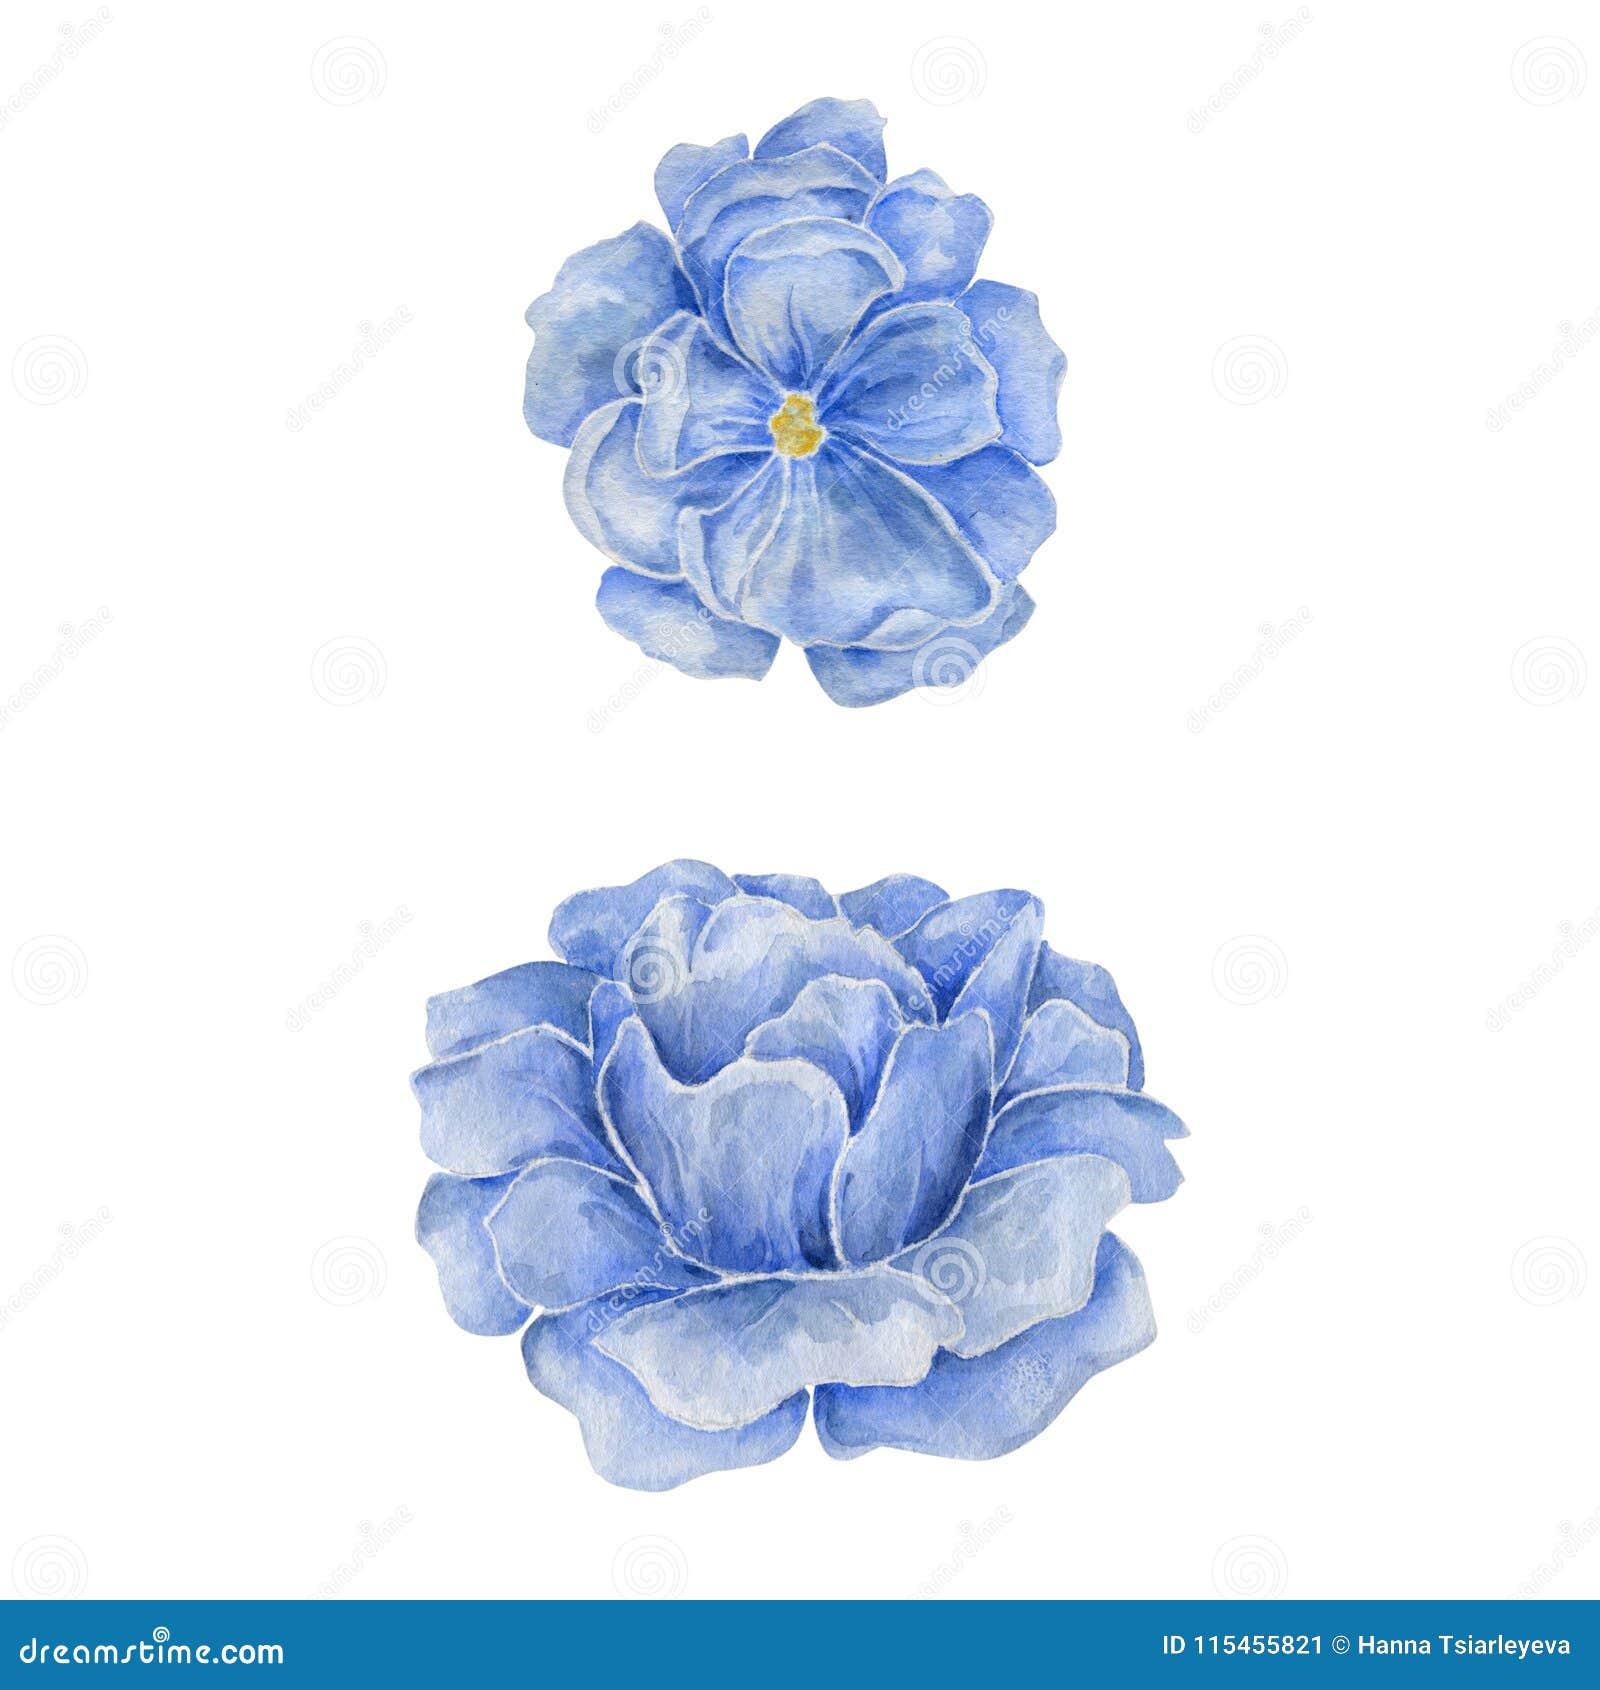 Blue Flower Watercolor Drawing Illustration Geometric Illustration